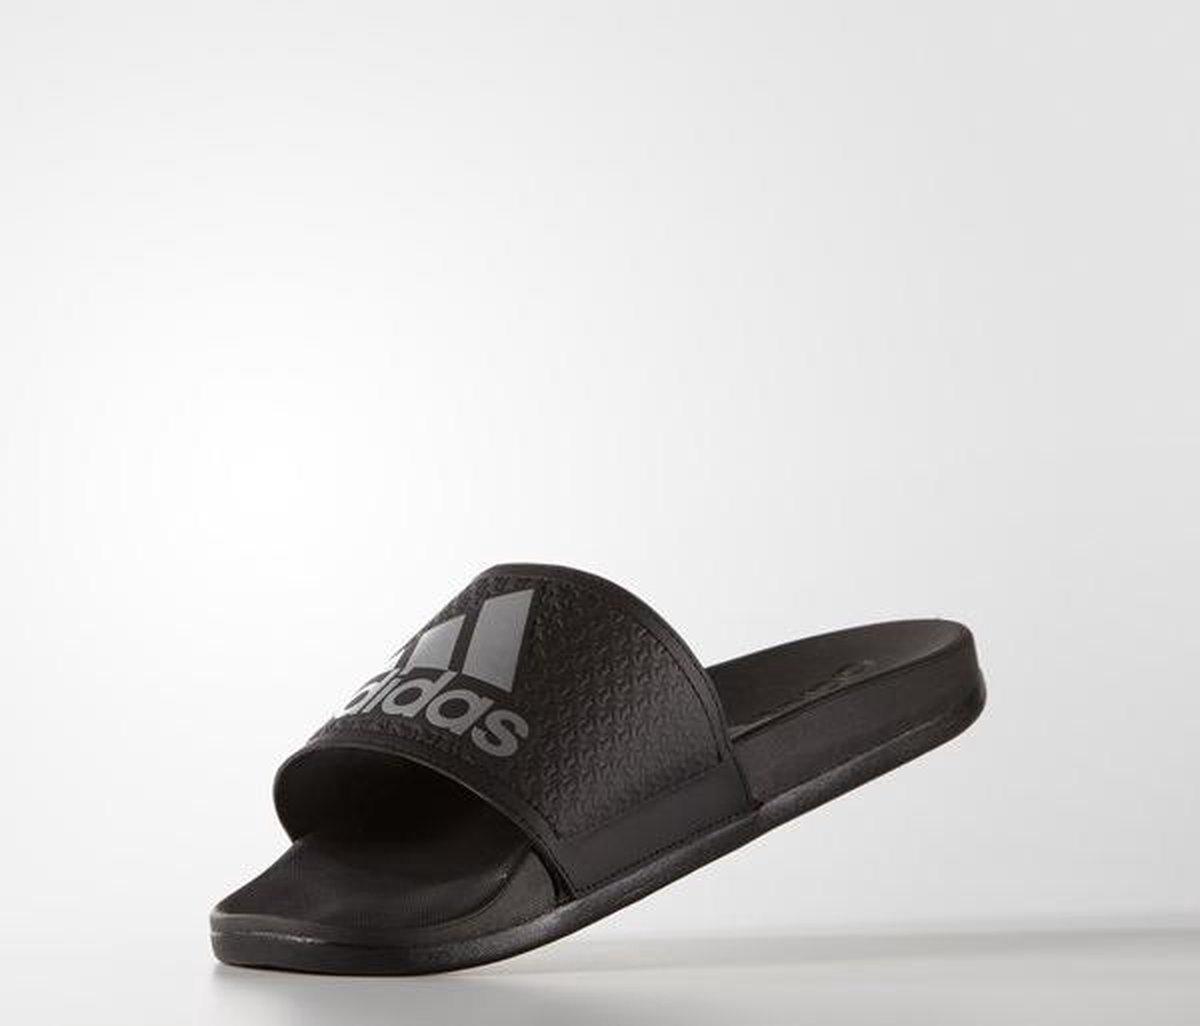 adidas cloudfoam adilette slides heren